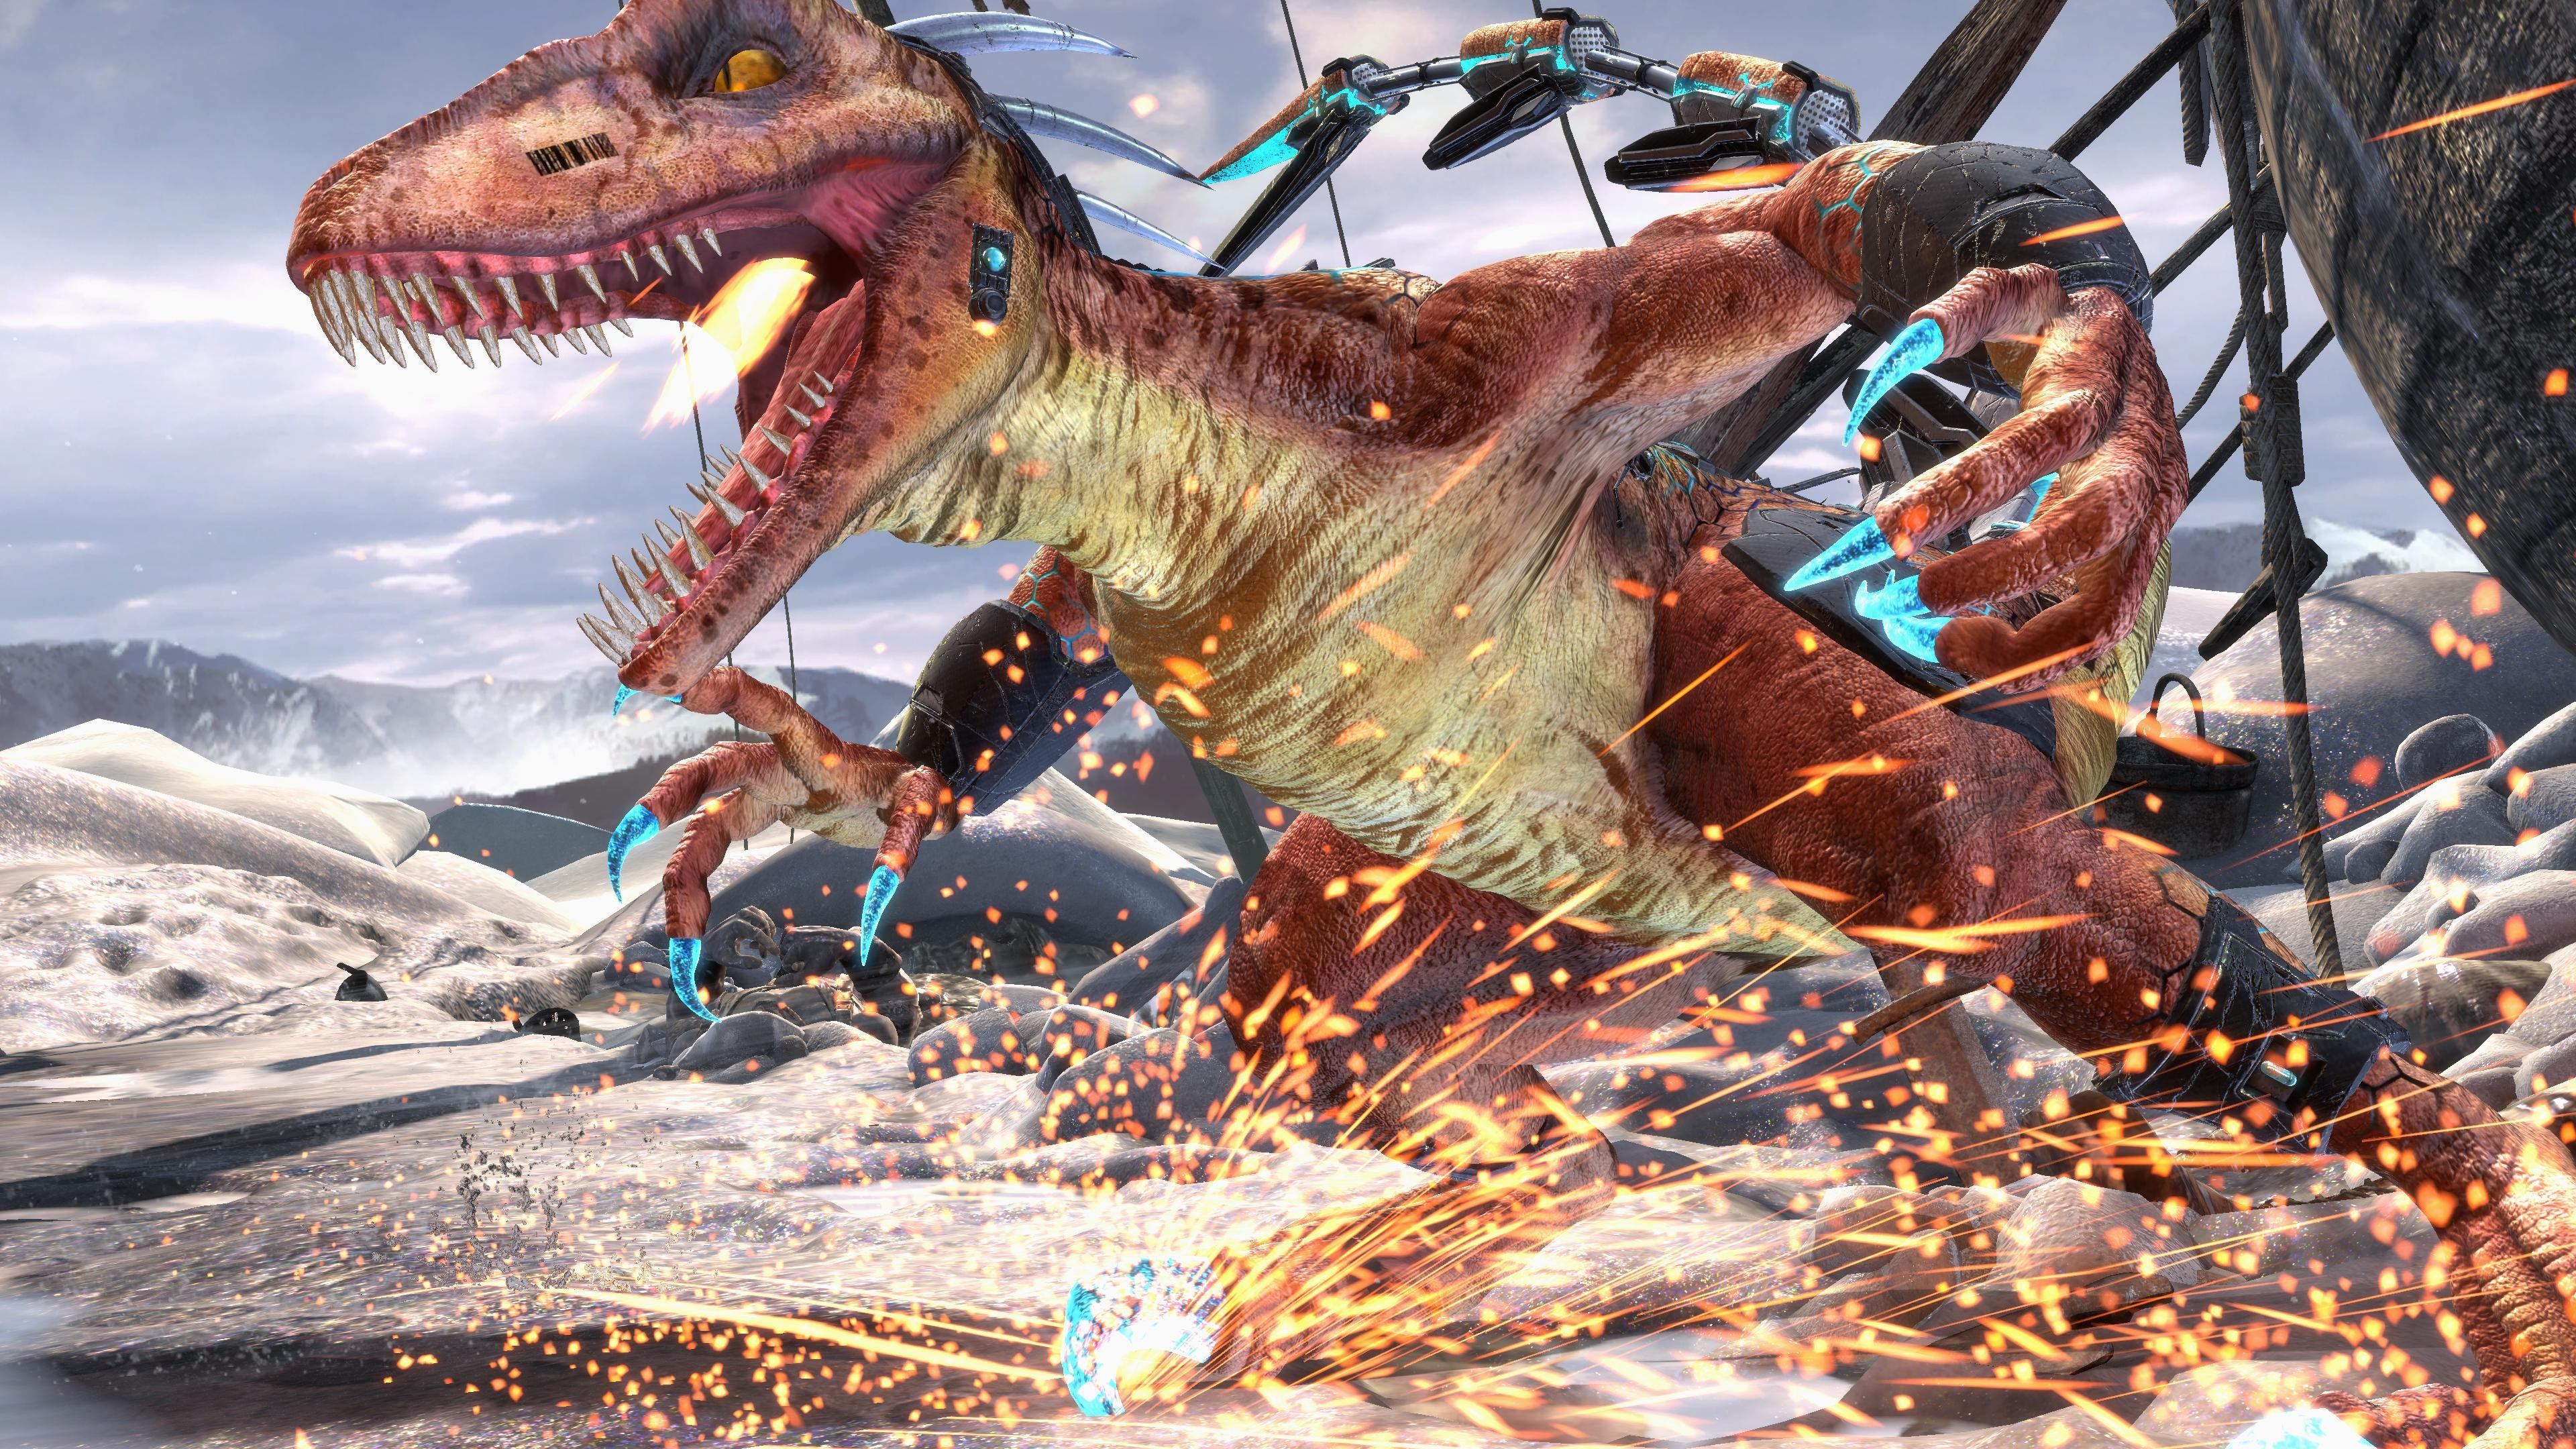 Wallpaper killer instinct 3 best games 2016 fighting pc games your resolution 1024x1024 voltagebd Images